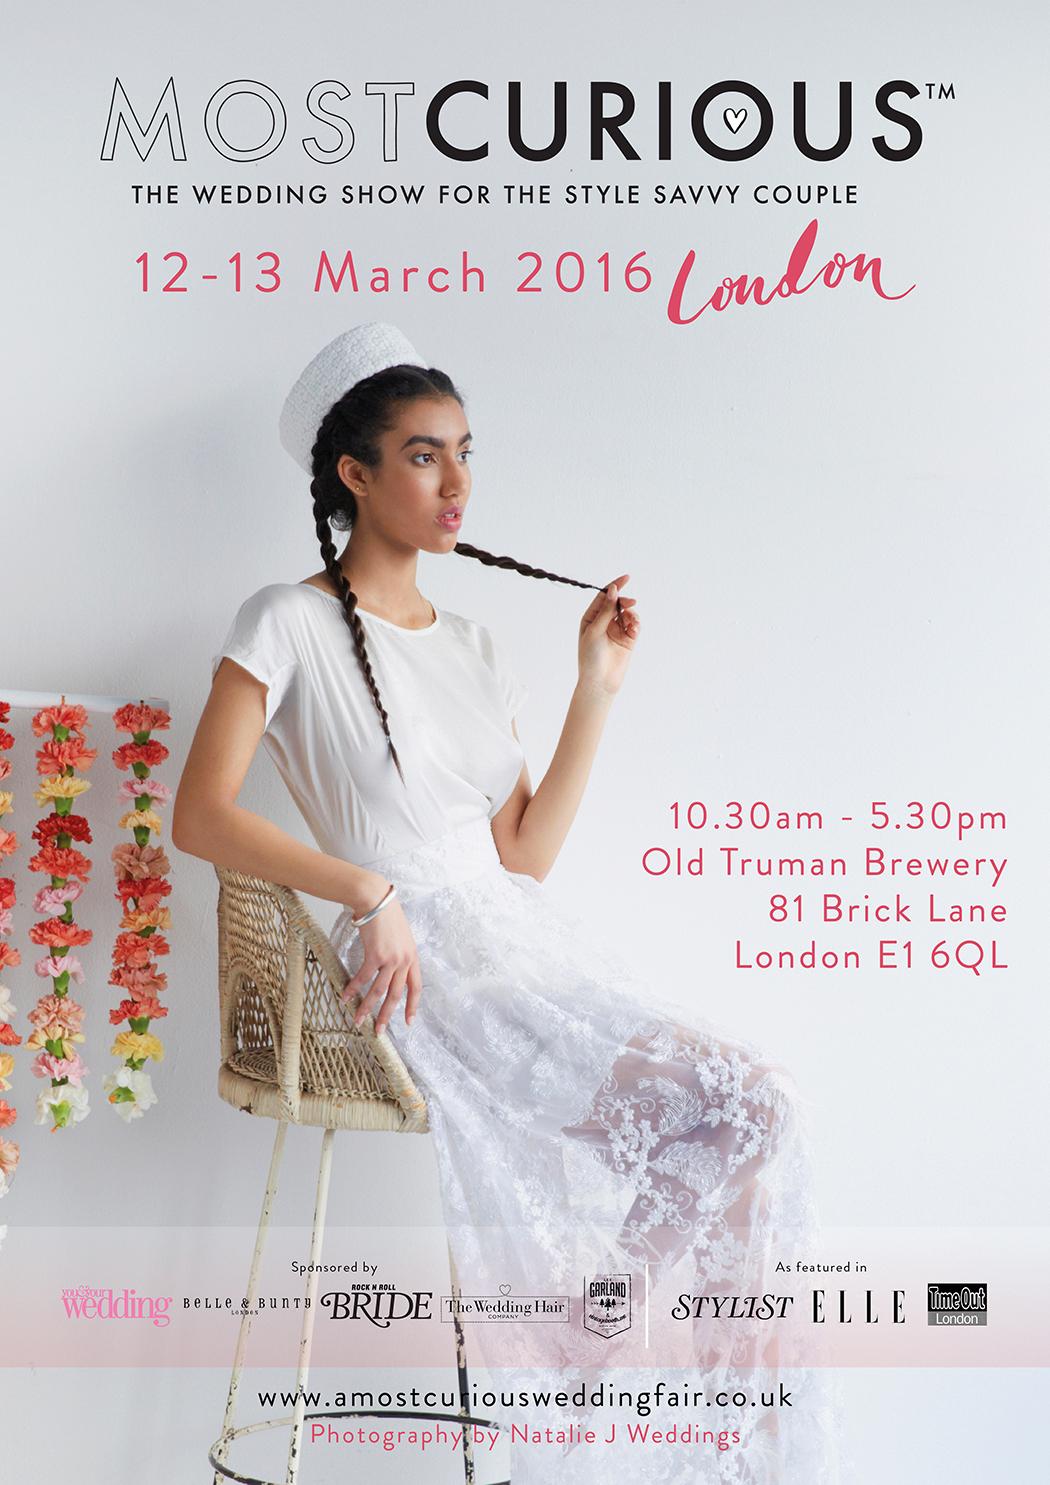 a-most-curious-wedding-fair-london-march-2016